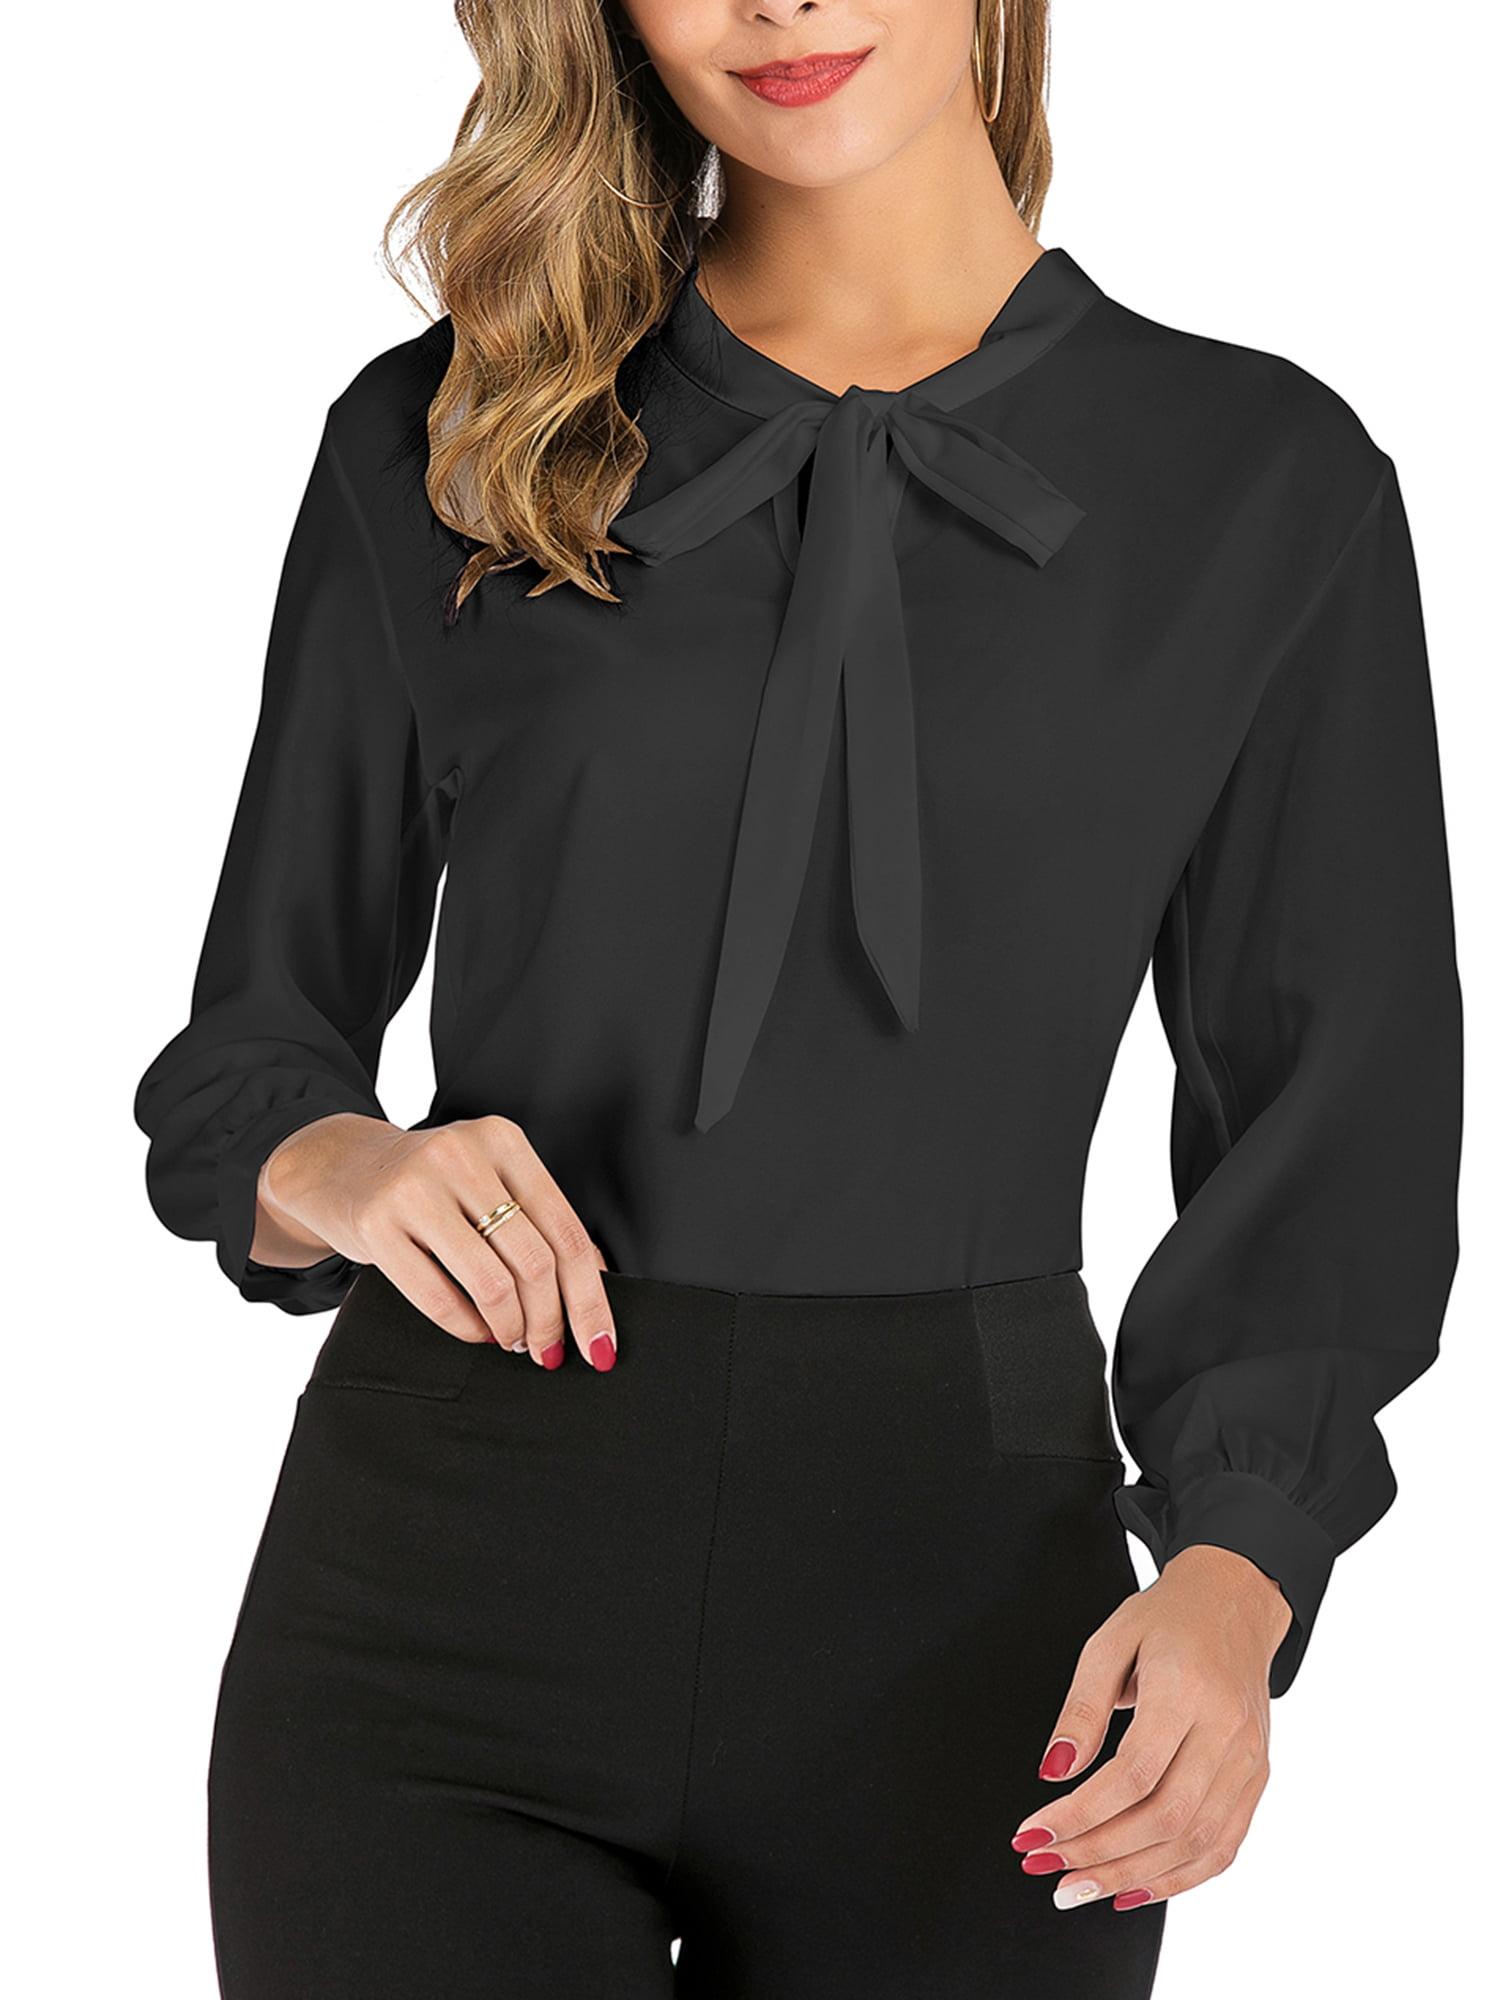 Lady Girl Chiffon Shirt Slim Ruffle Stand Collar Long Sleeve Top Blouse Retro